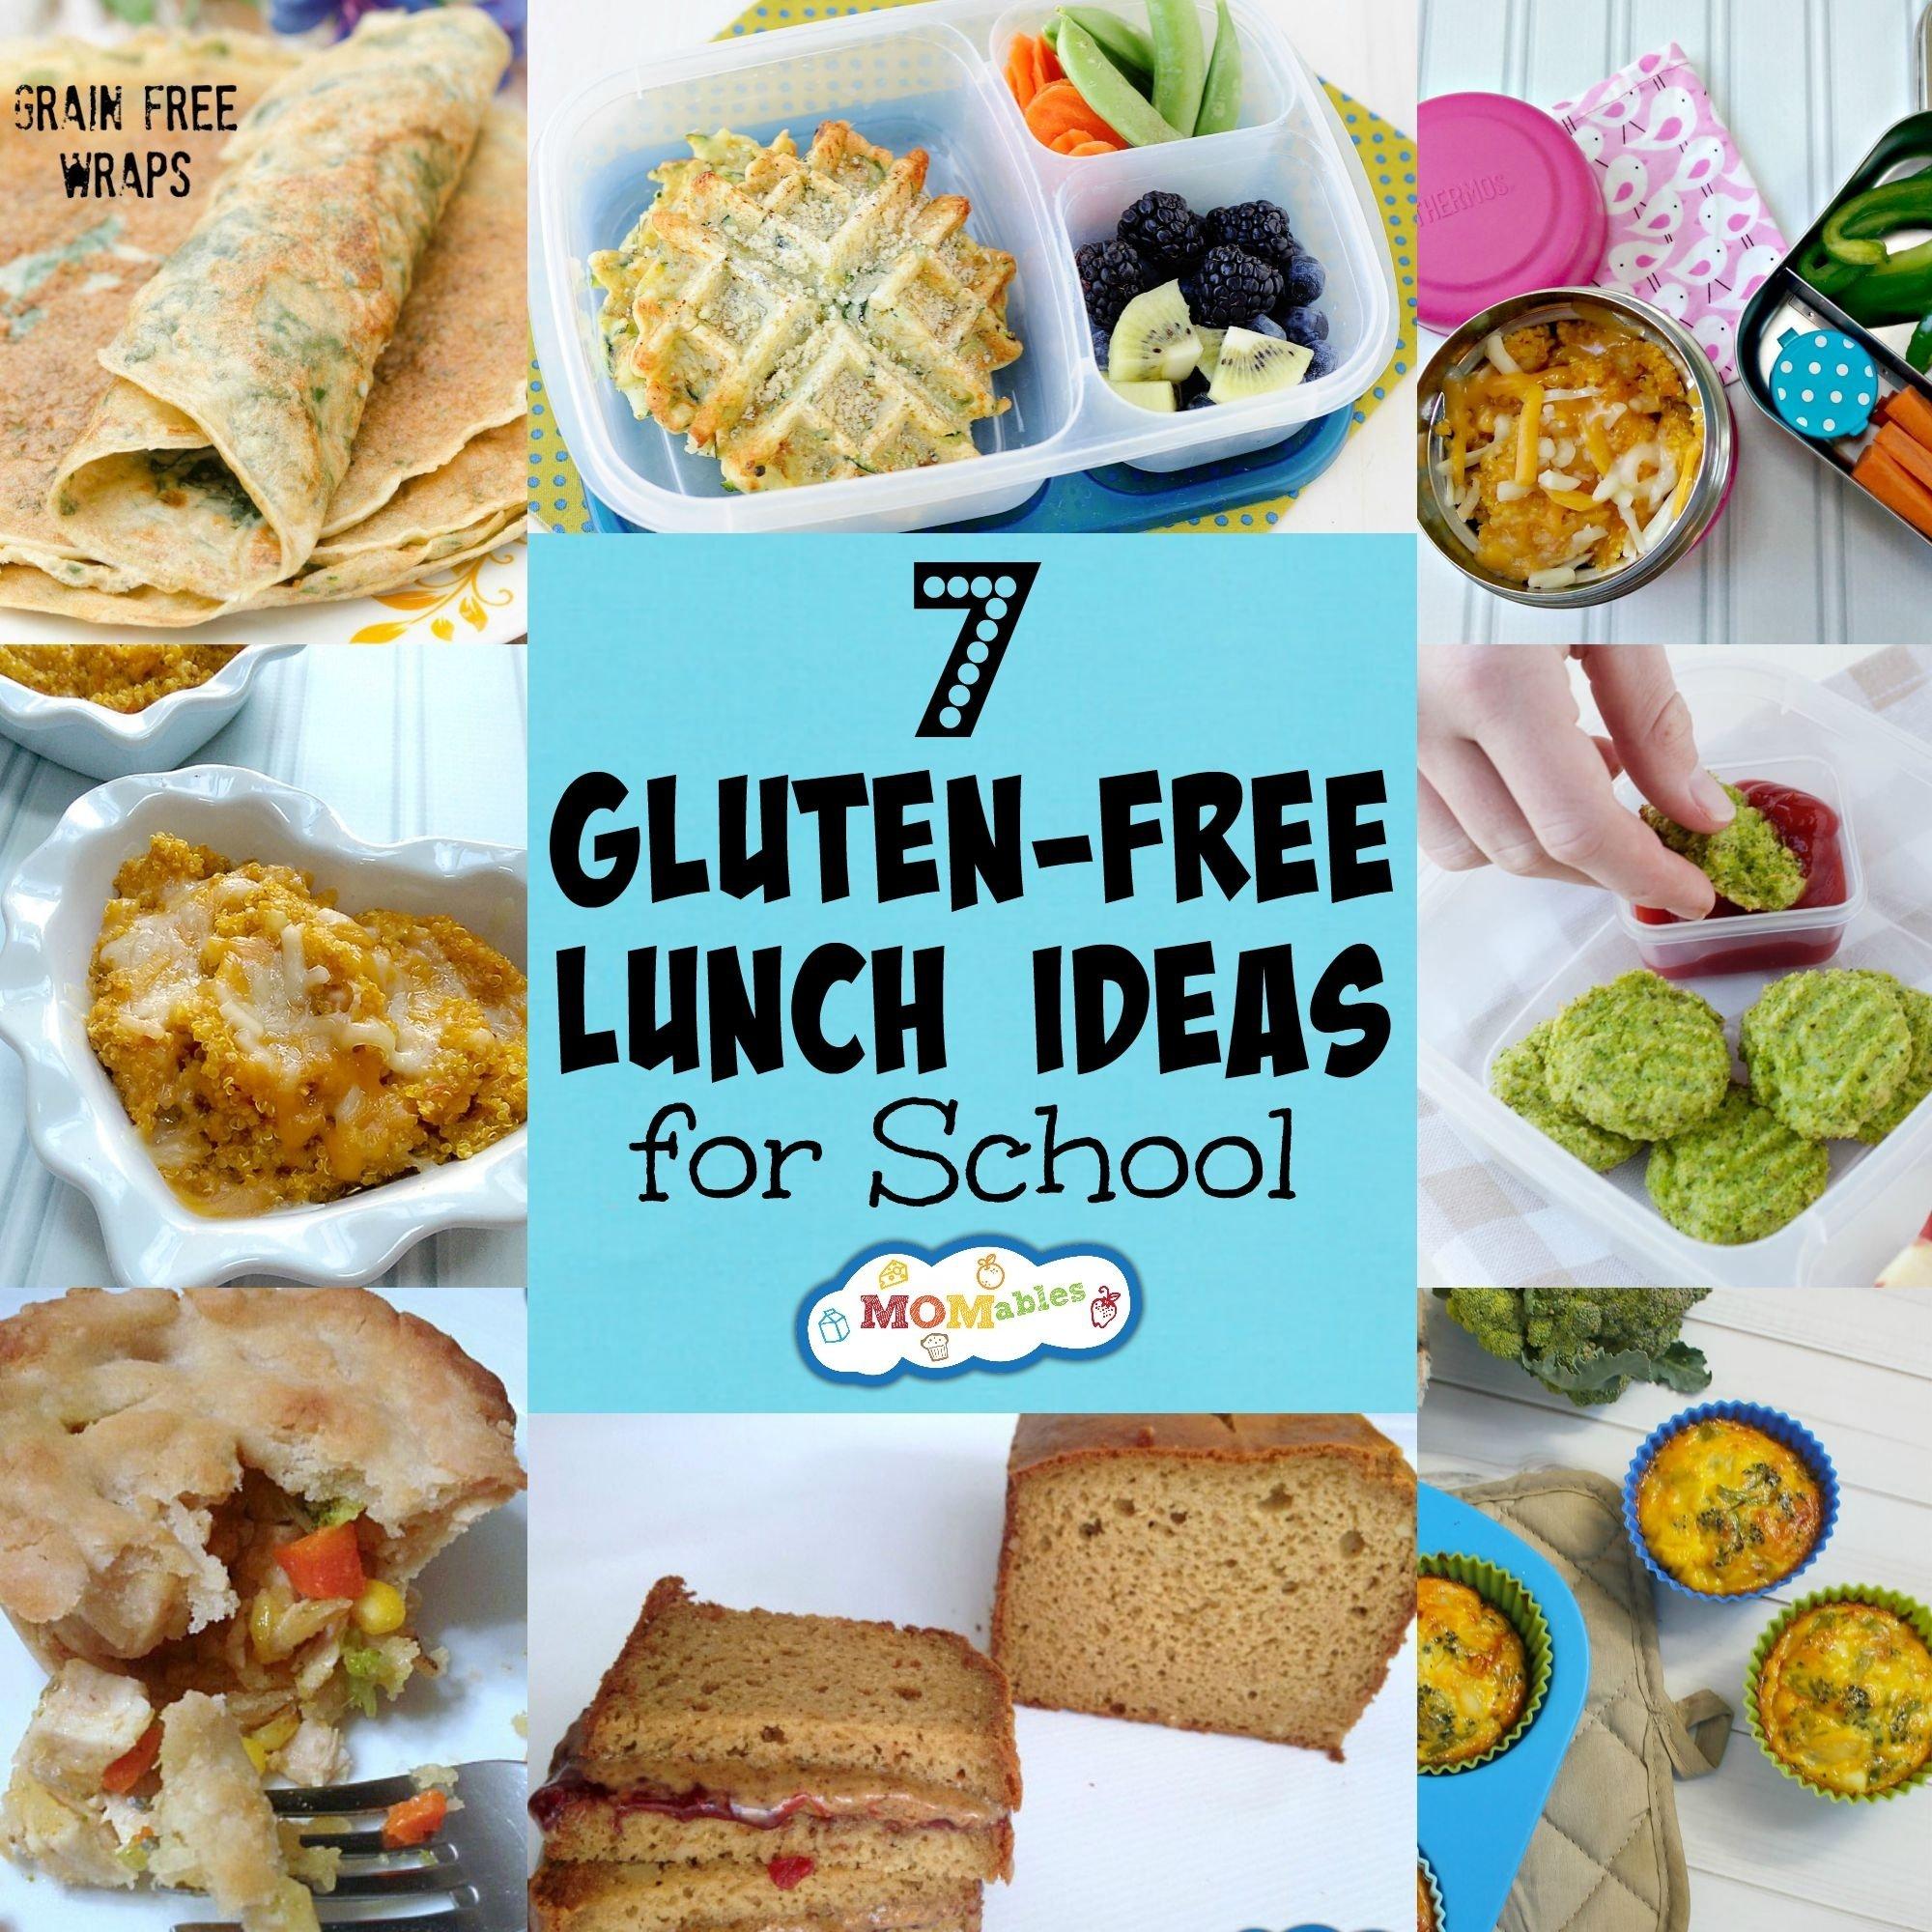 10 Spectacular Gluten Free Breakfast Ideas Quick 7 gluten free lunch ideas for school momables 11 2021